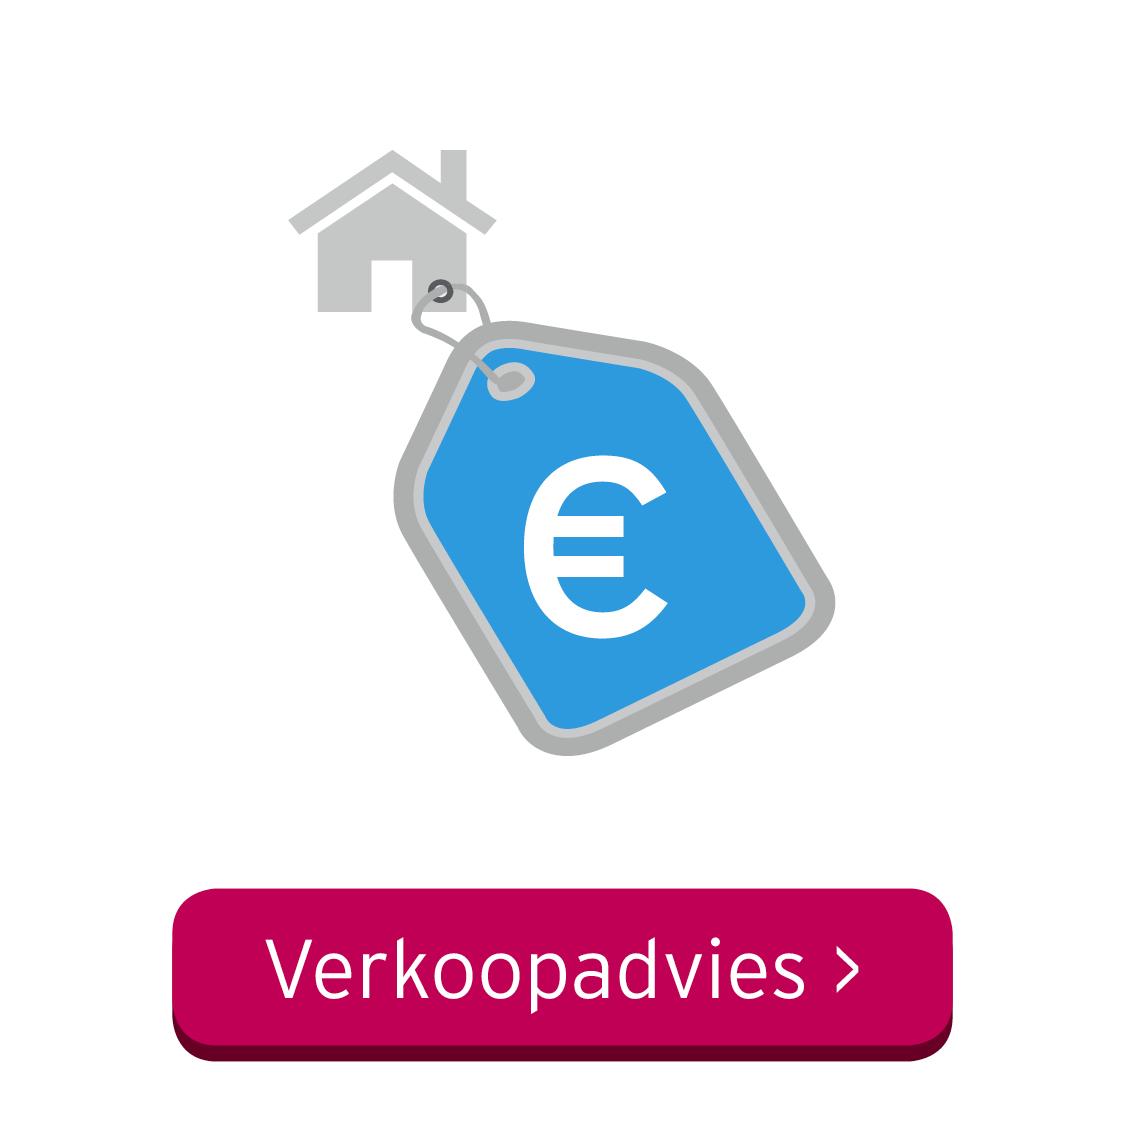 Verkoopadvies Woonaccent Makelaars Westerbork